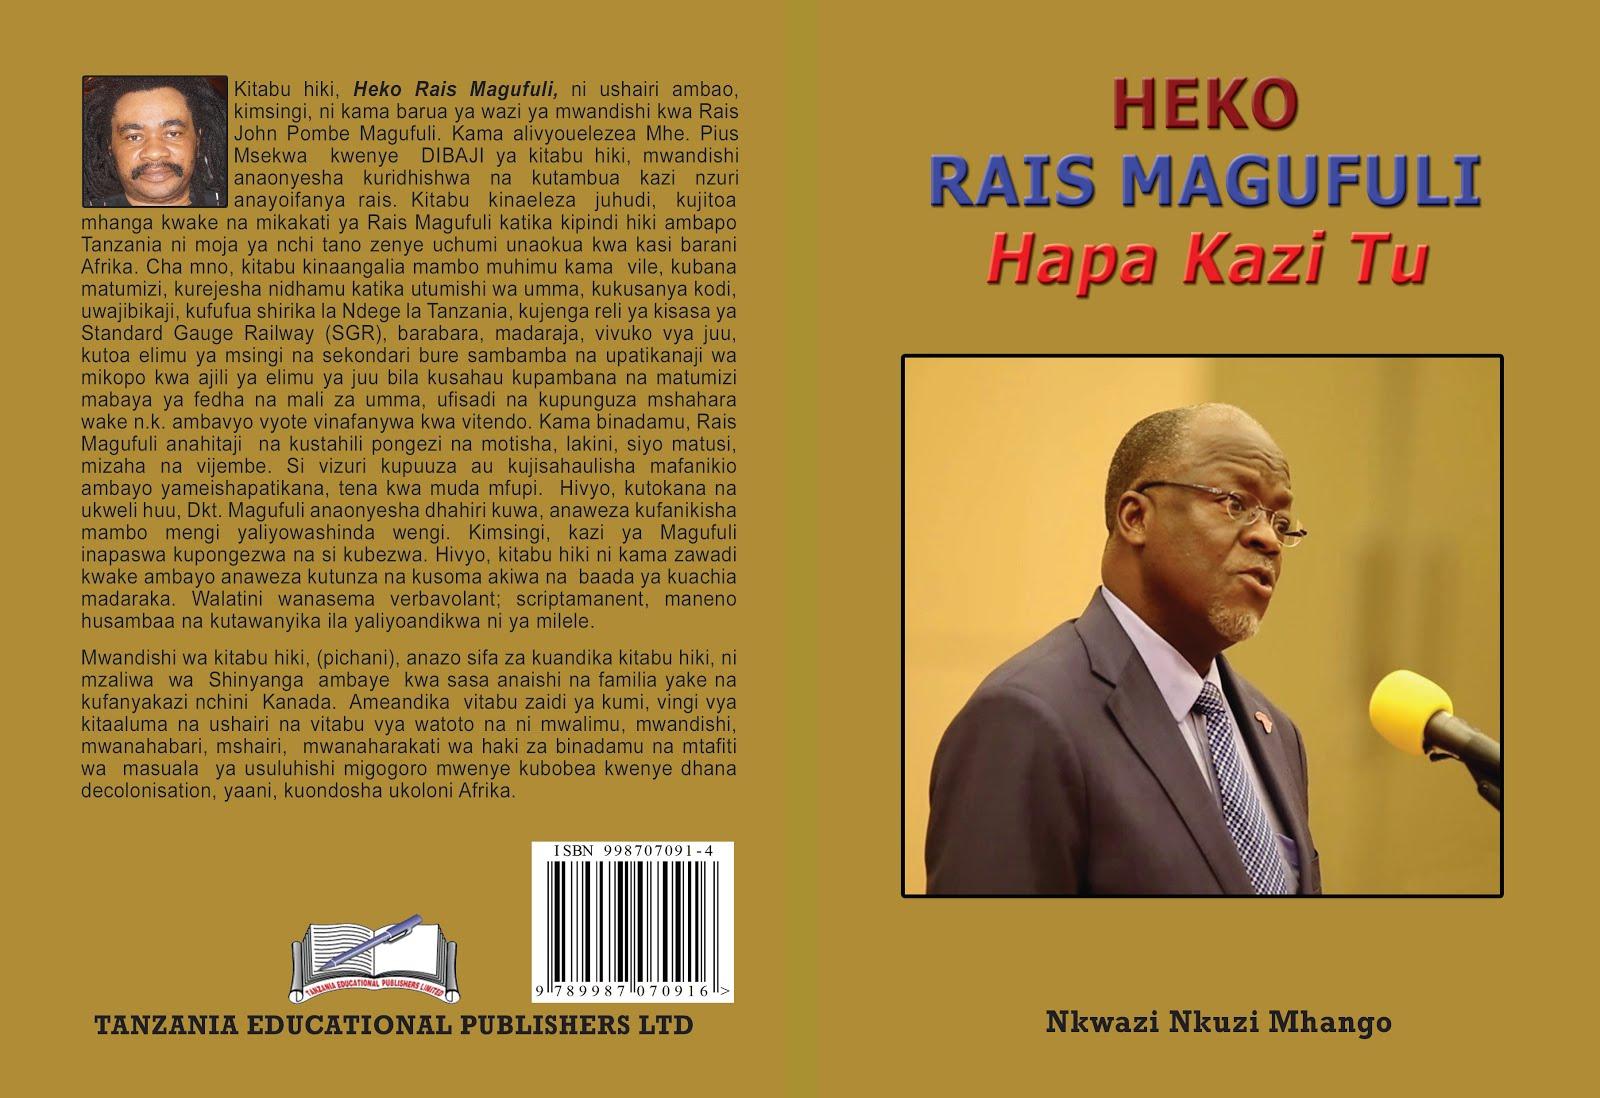 Heko Rais Magufuli